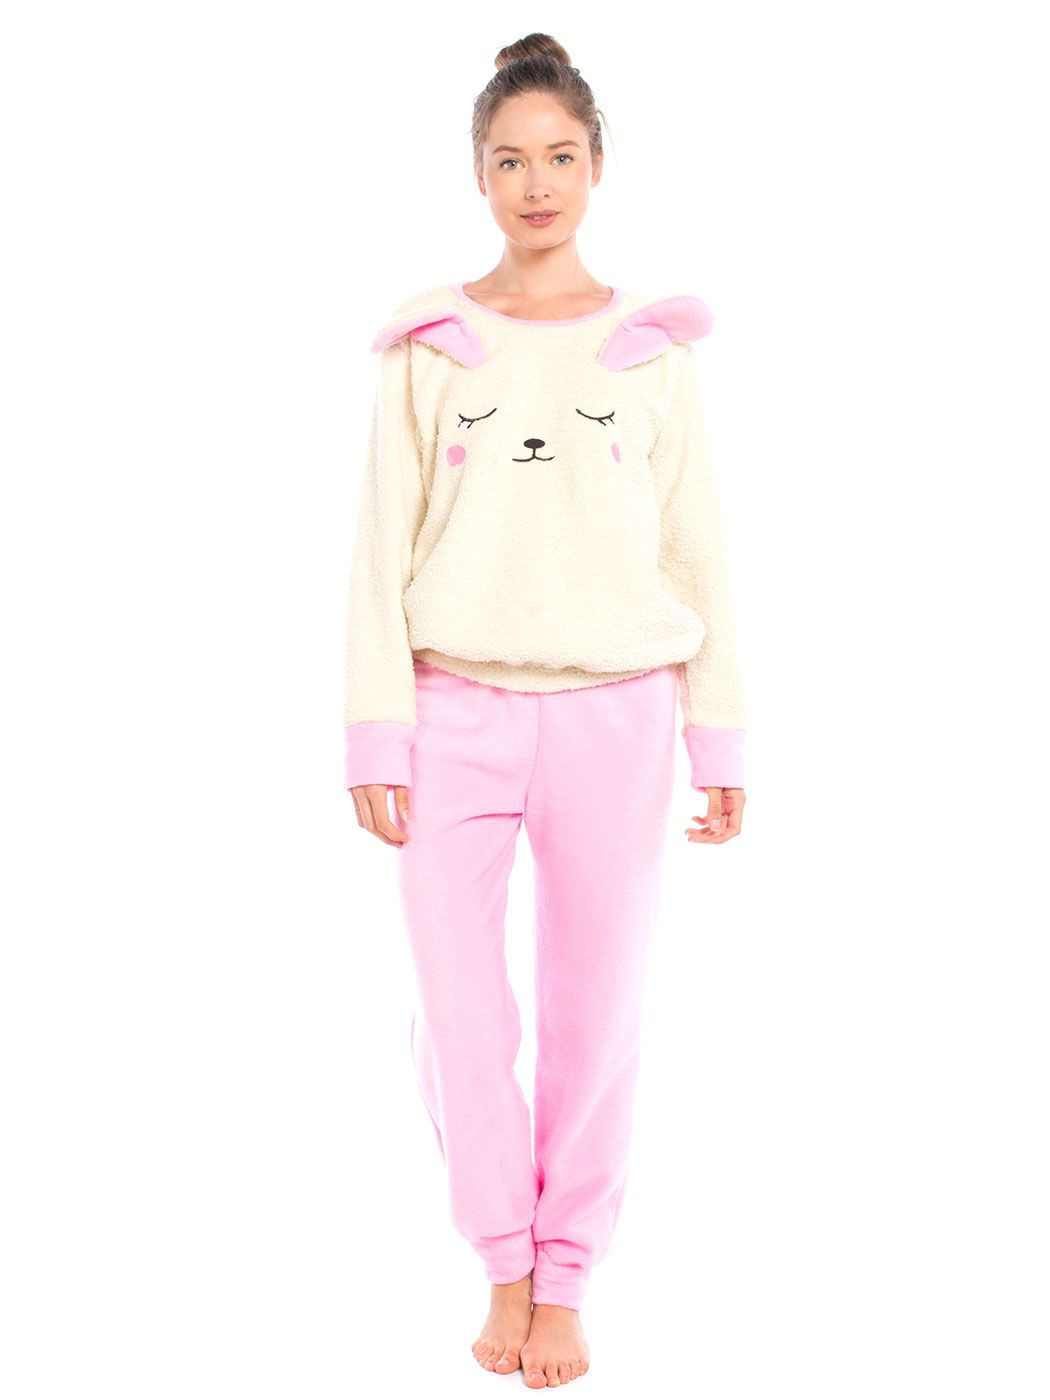 4f3b3d7b299f Adquiere en www.clickonero.com.mx #pijama #frio #diciembre #invierno ...